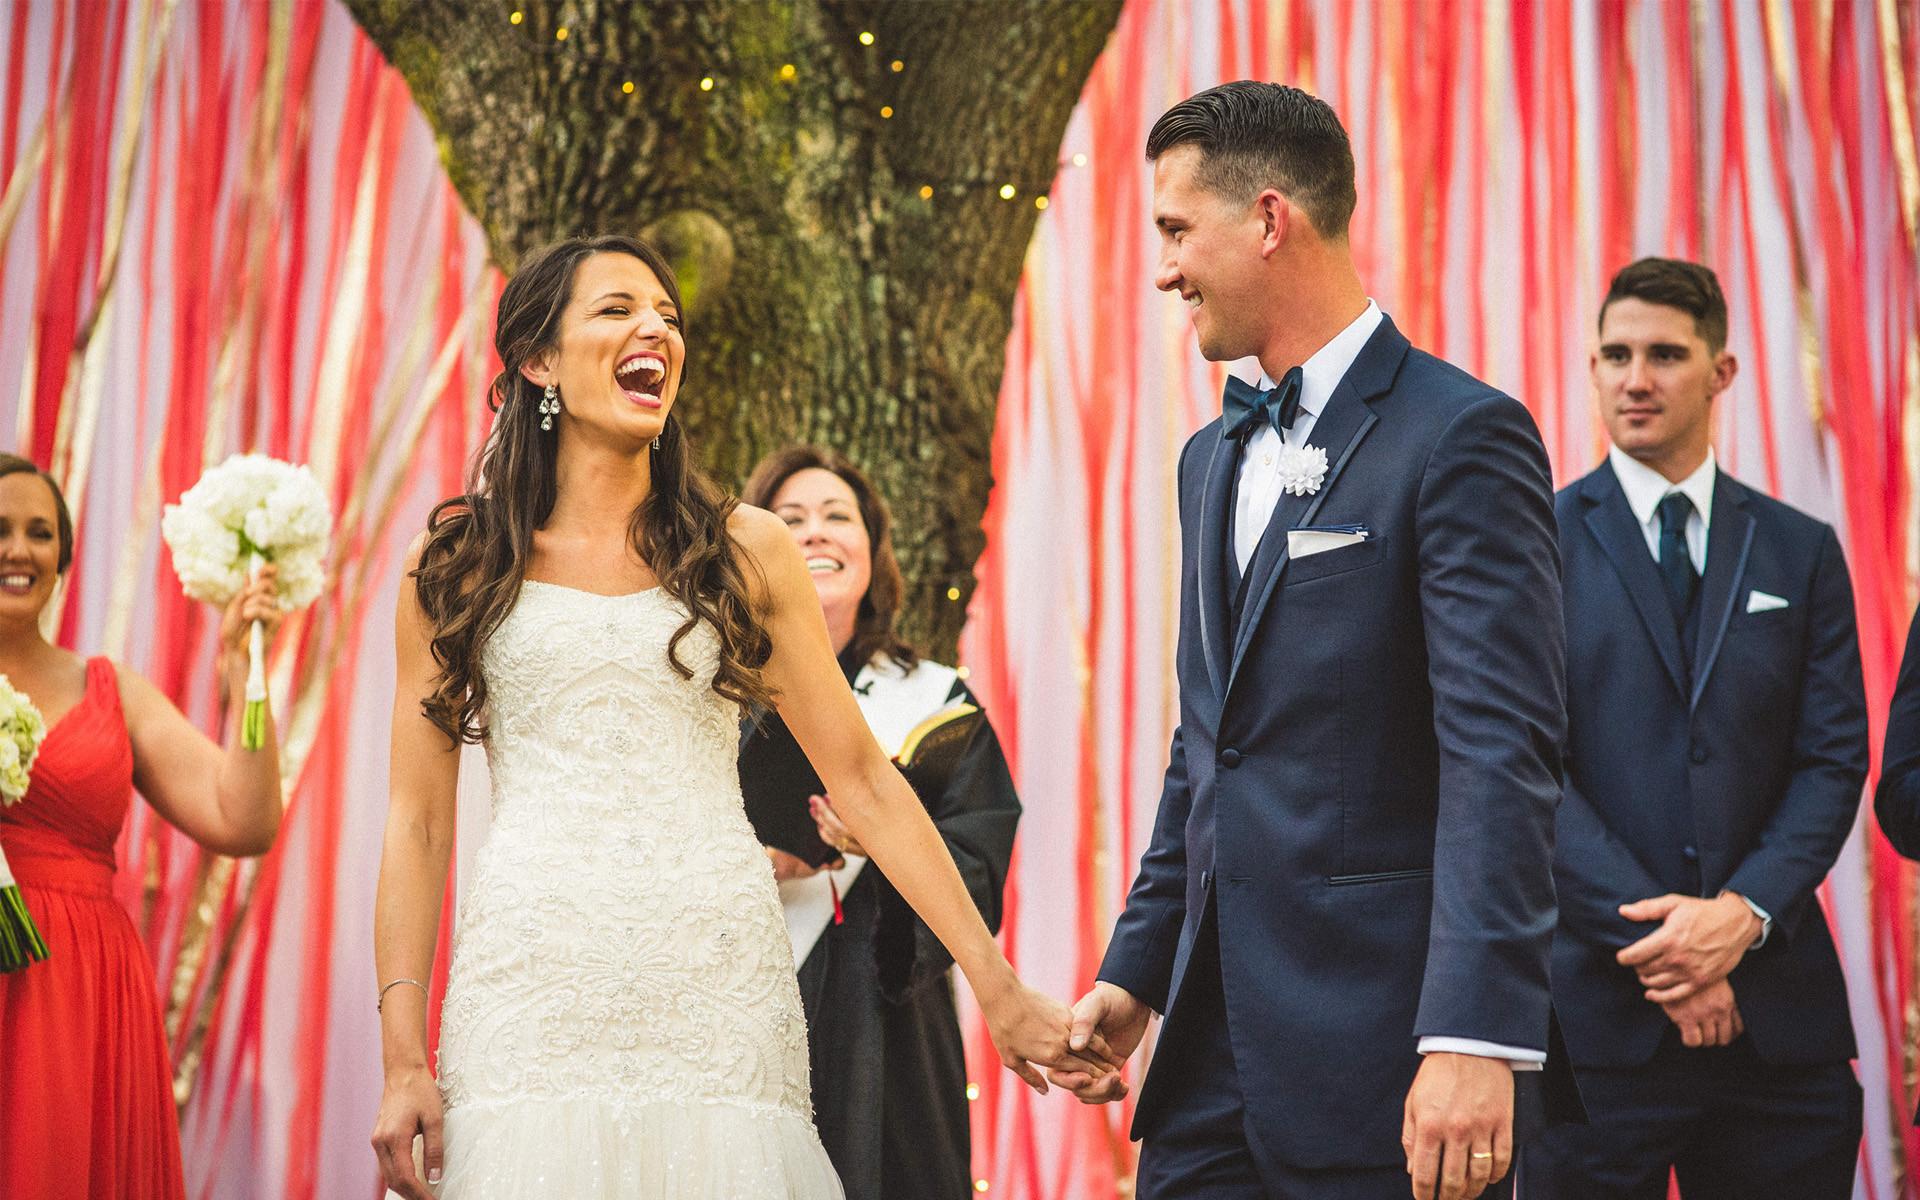 Chance meeting, epic wedding ensues